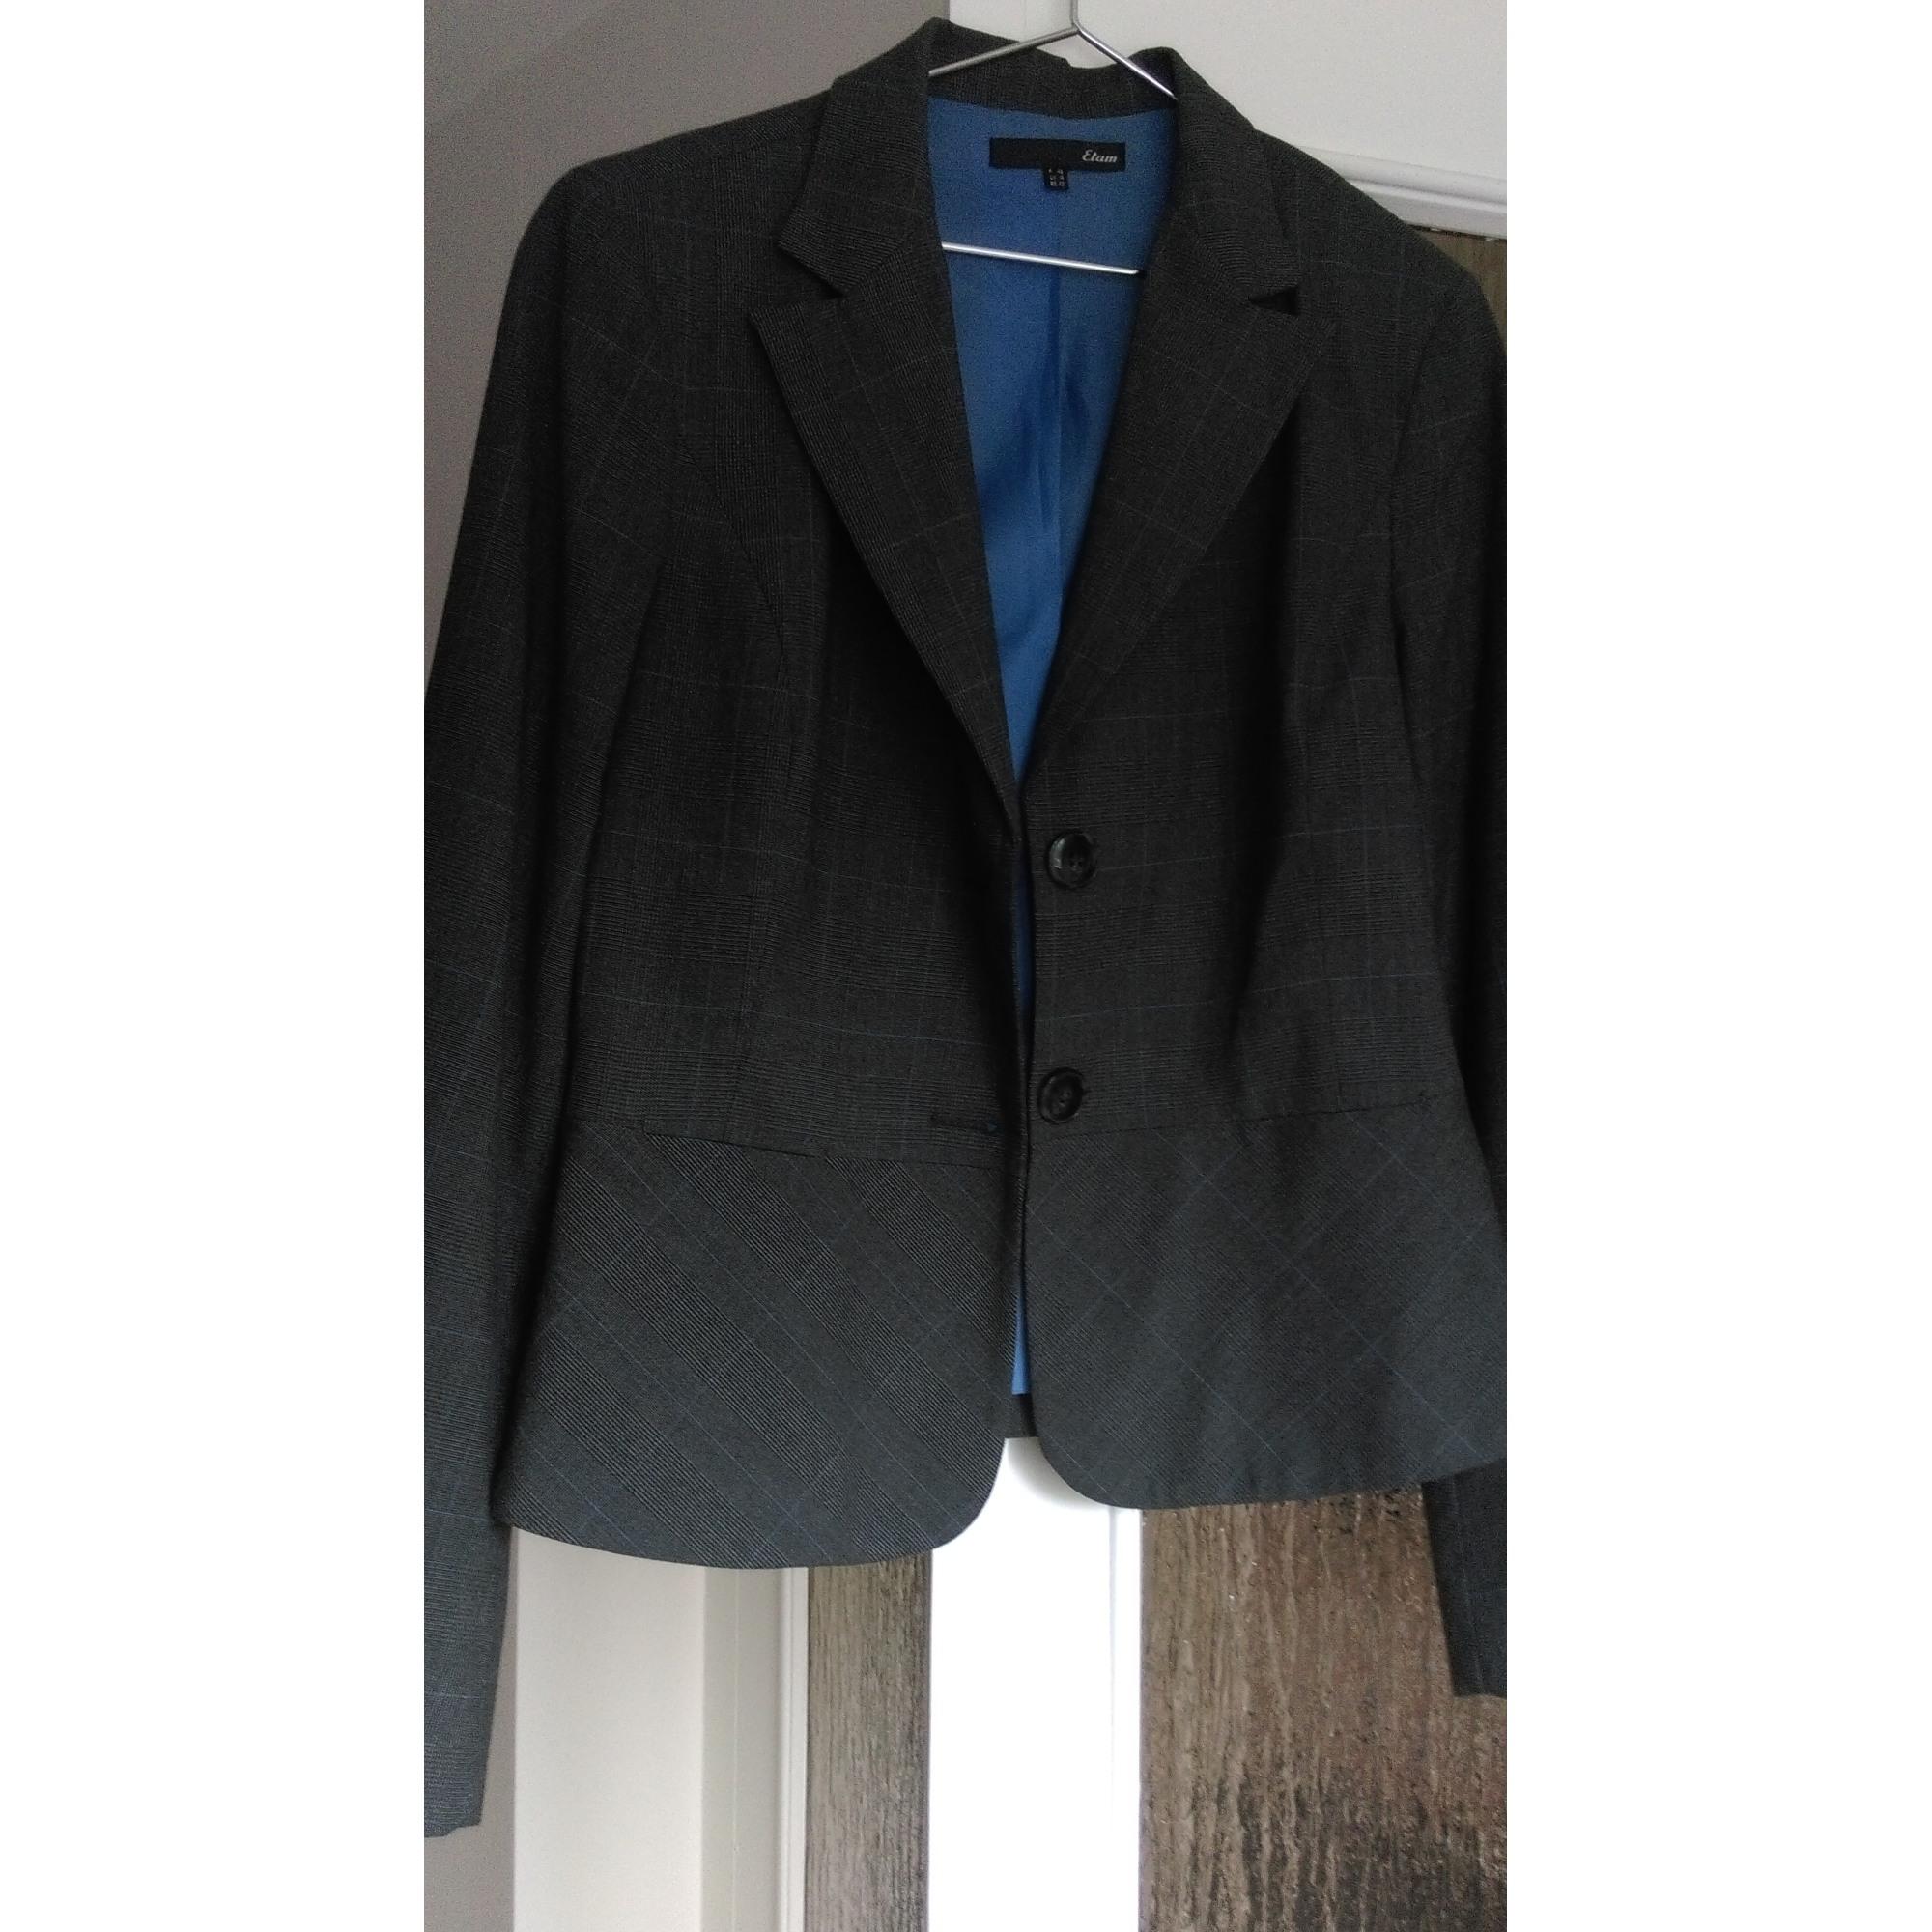 veste ETAM vendu tailleur Blazer LXL par T4 42 Agathe123 bleu dEUvcyqAO f0db4cc02f9